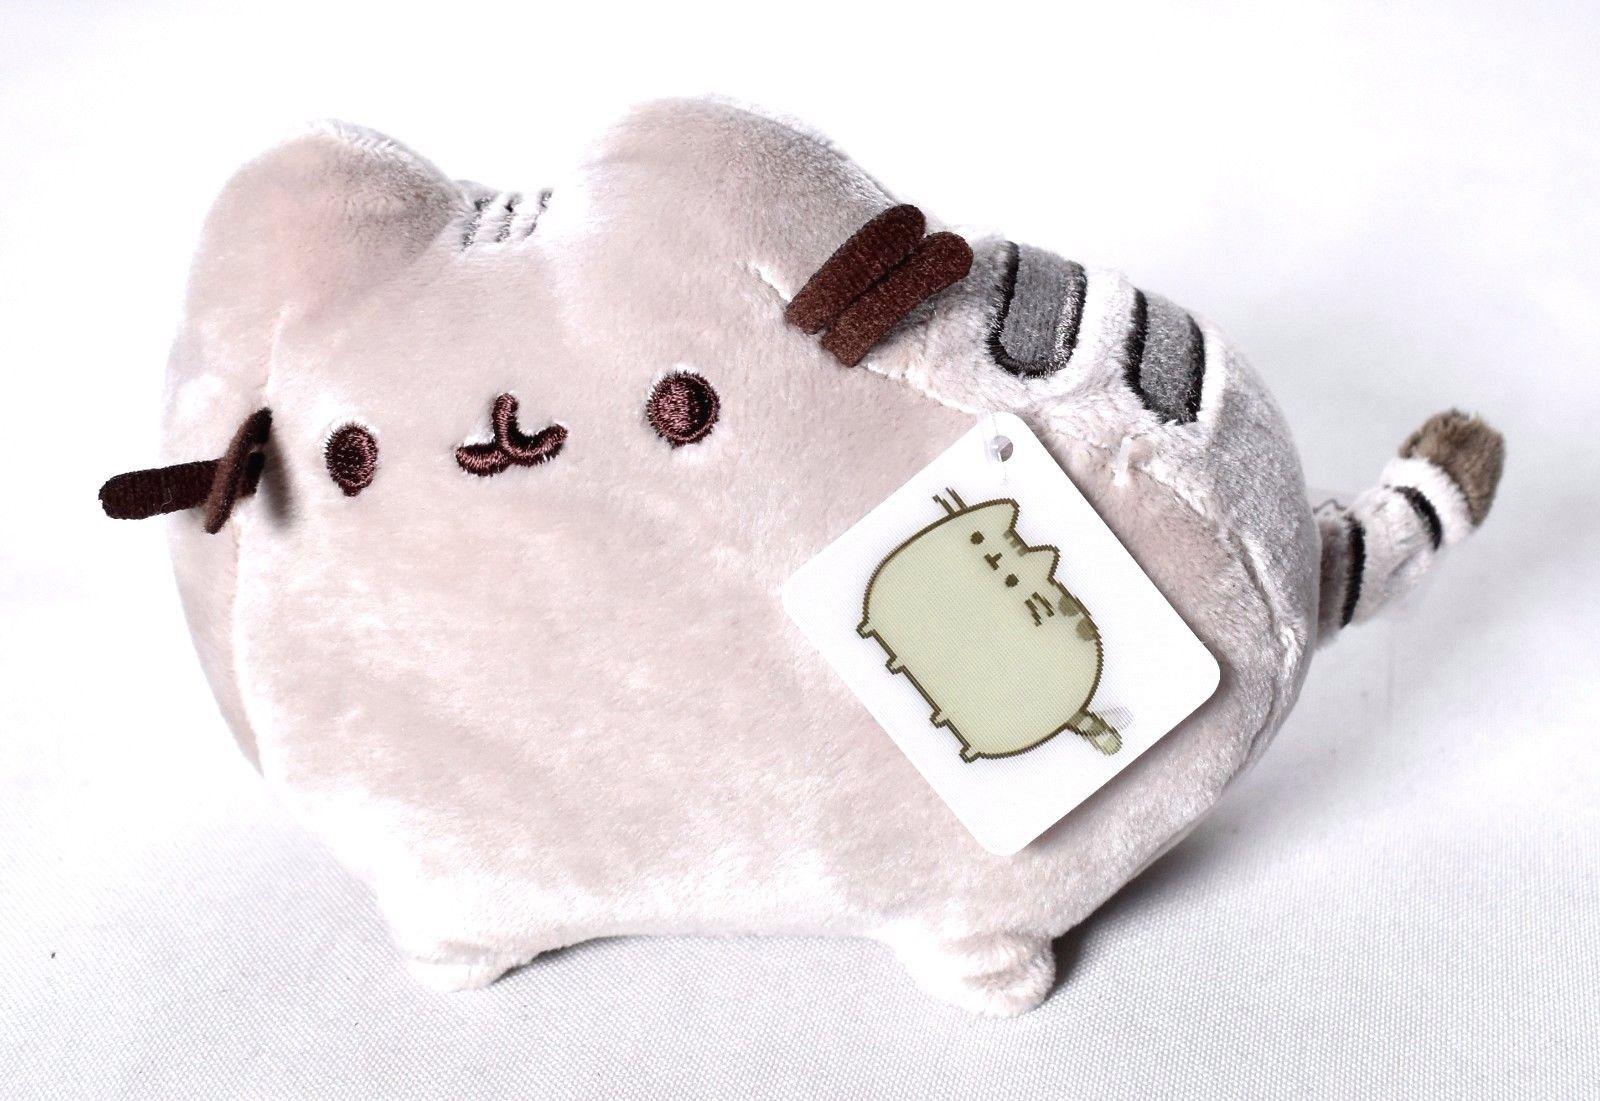 Gund Pusheen Plush 6 Cat Stuffed Toy Animal 4048095 New Pusheen Plush Pusheen Cat Plush Pet Toys [ 1101 x 1600 Pixel ]